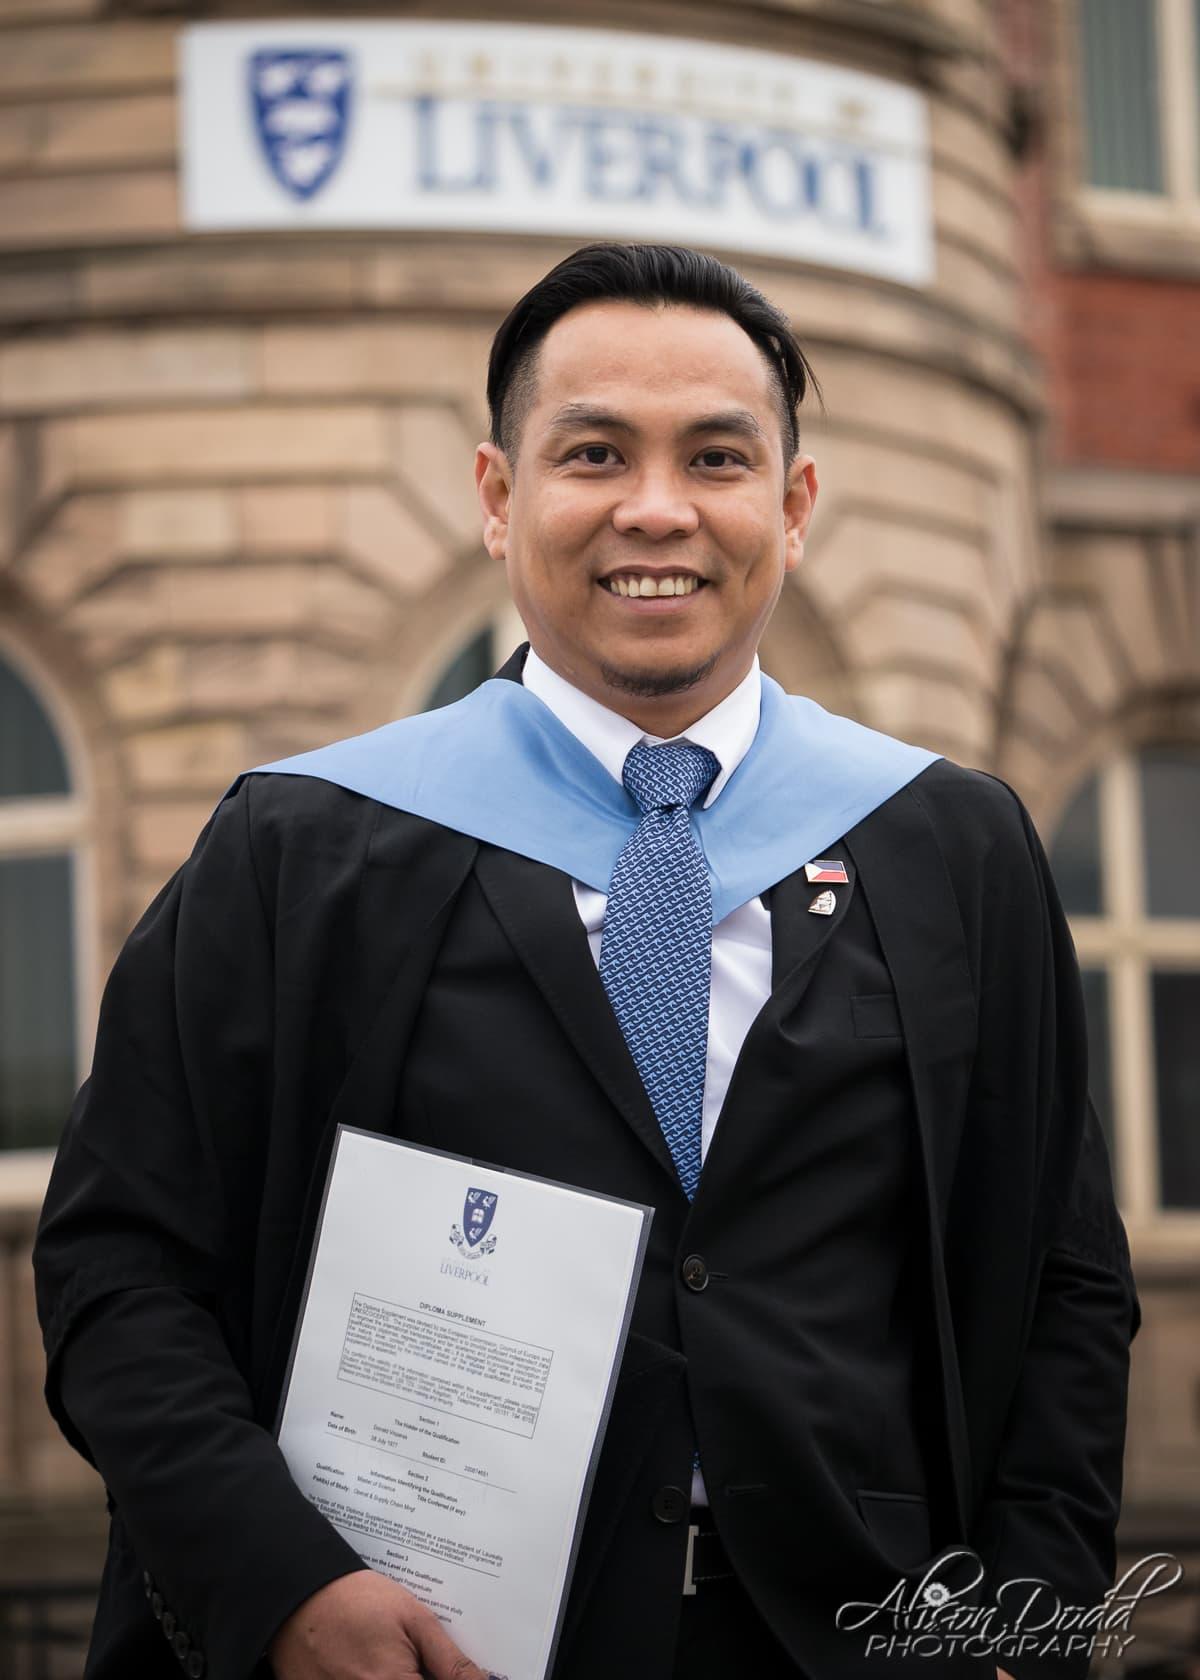 Graduation Photography liverpool John Moores University